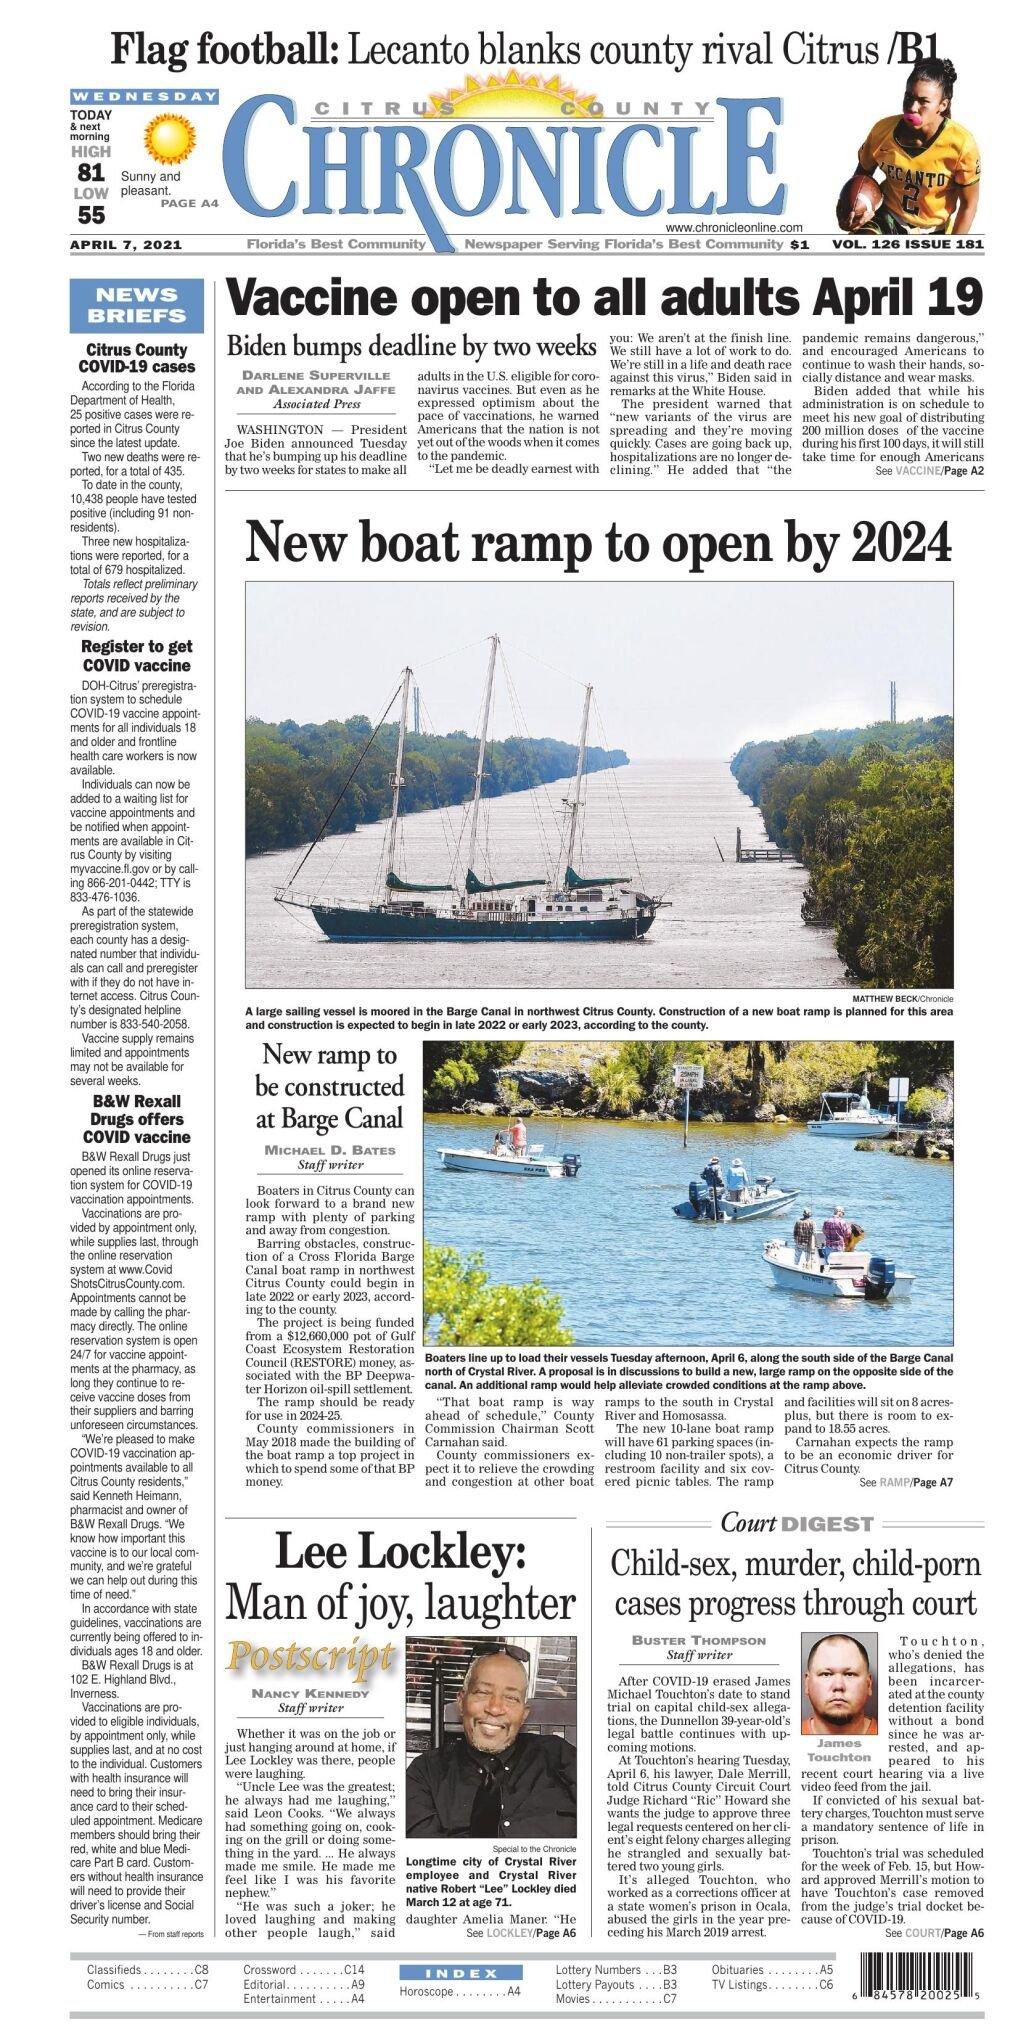 Citrus County Chronicle e edition Apr 7, 2021